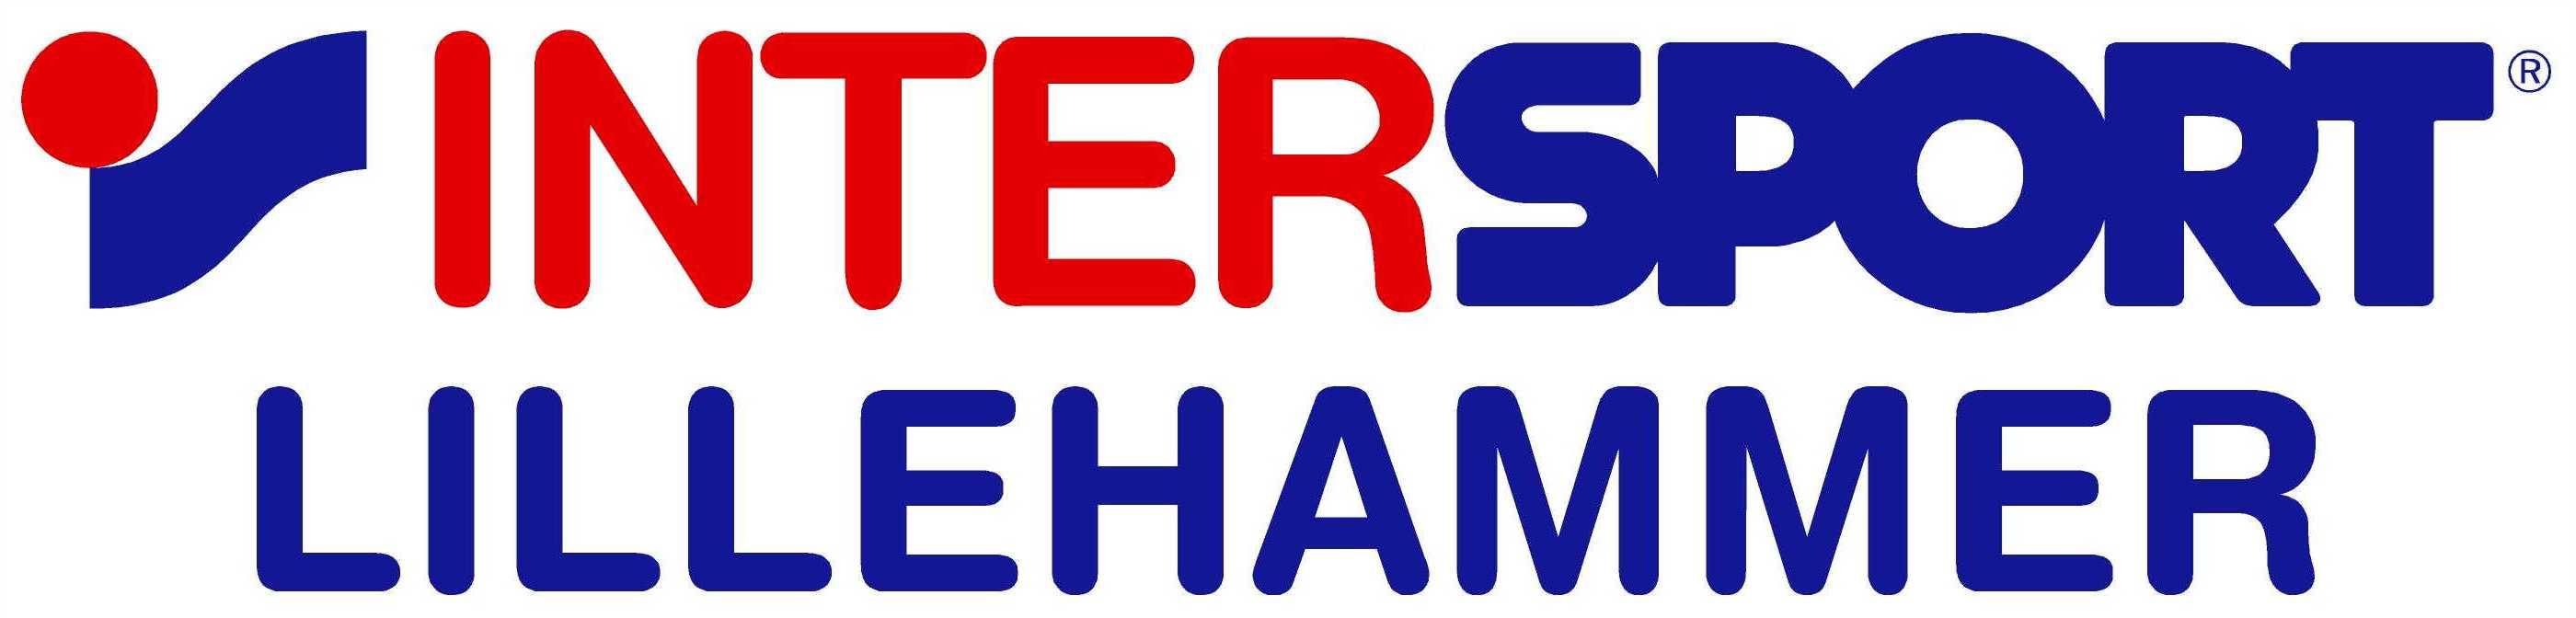 offisiell-logo-intersport-lillehammer